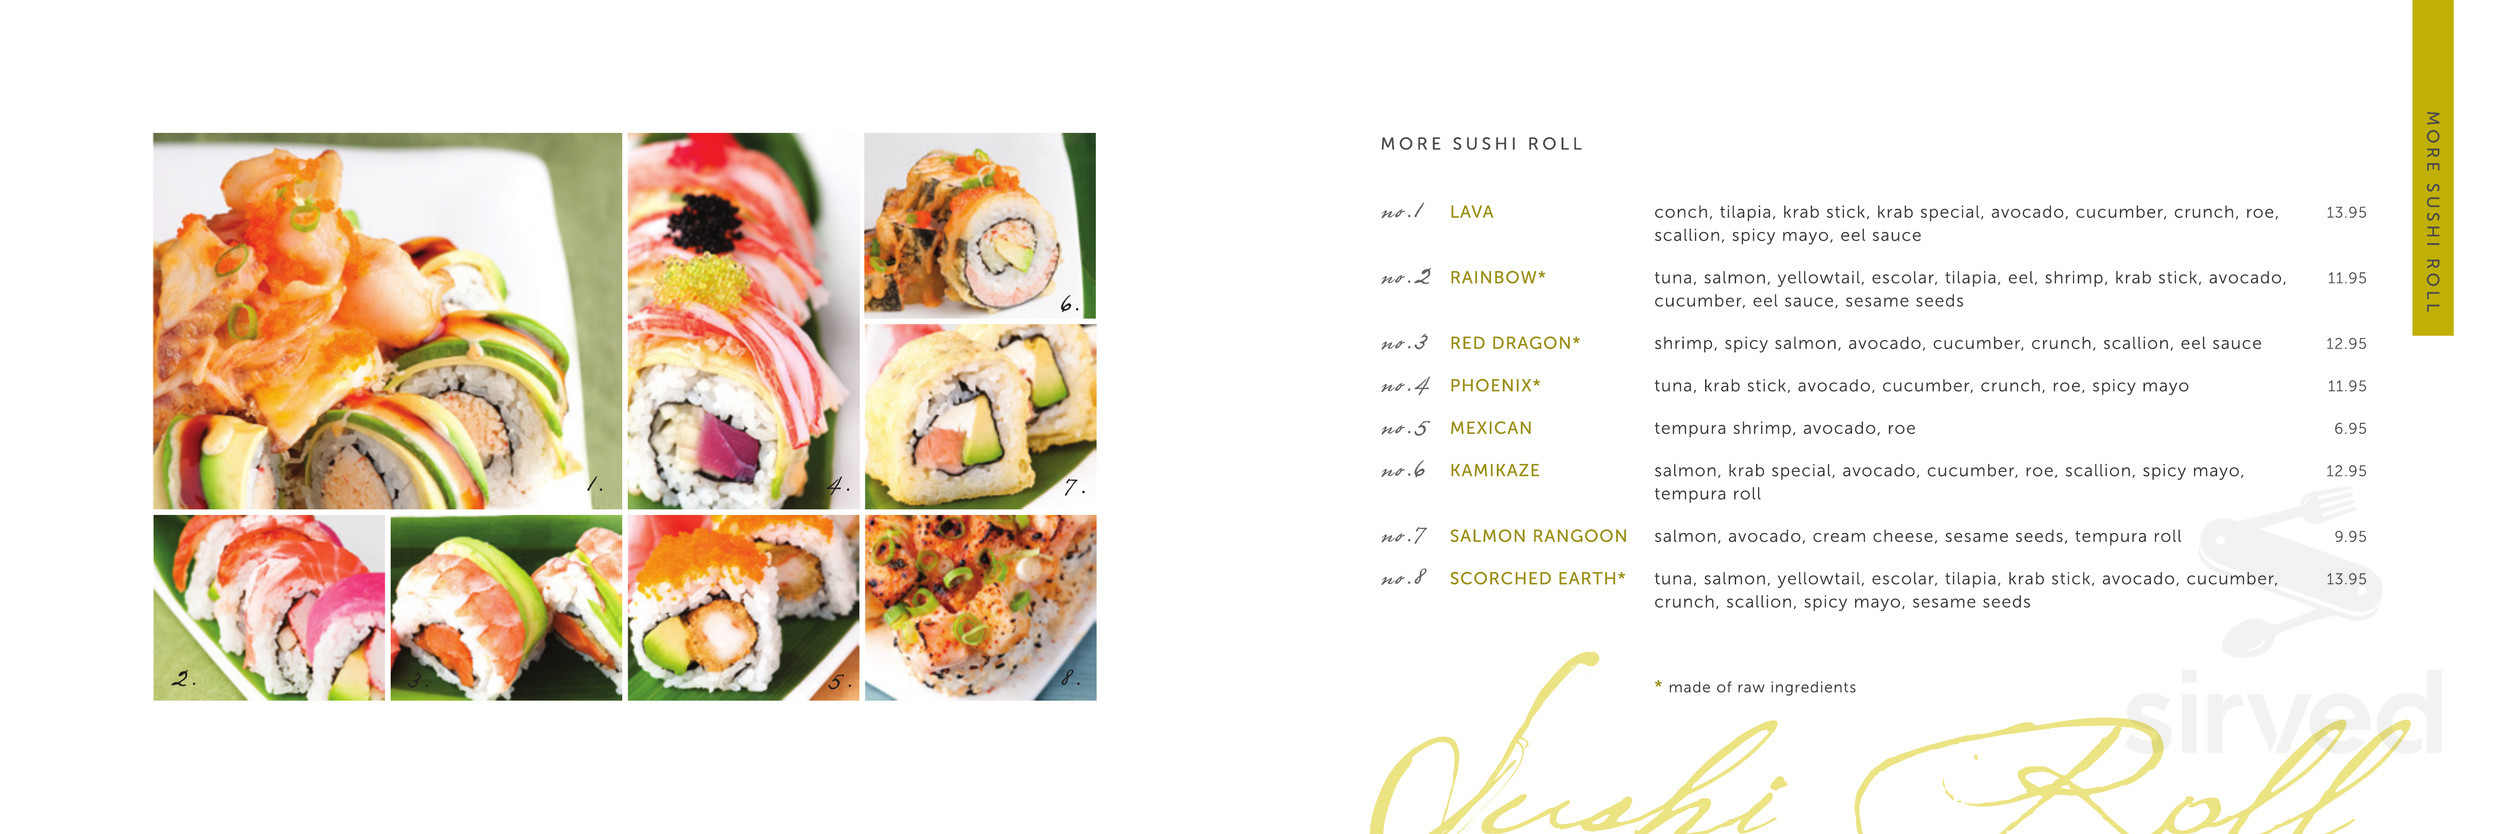 ORIGAMI REDIRECT — KELP SUSHI JOINT | 834x2500